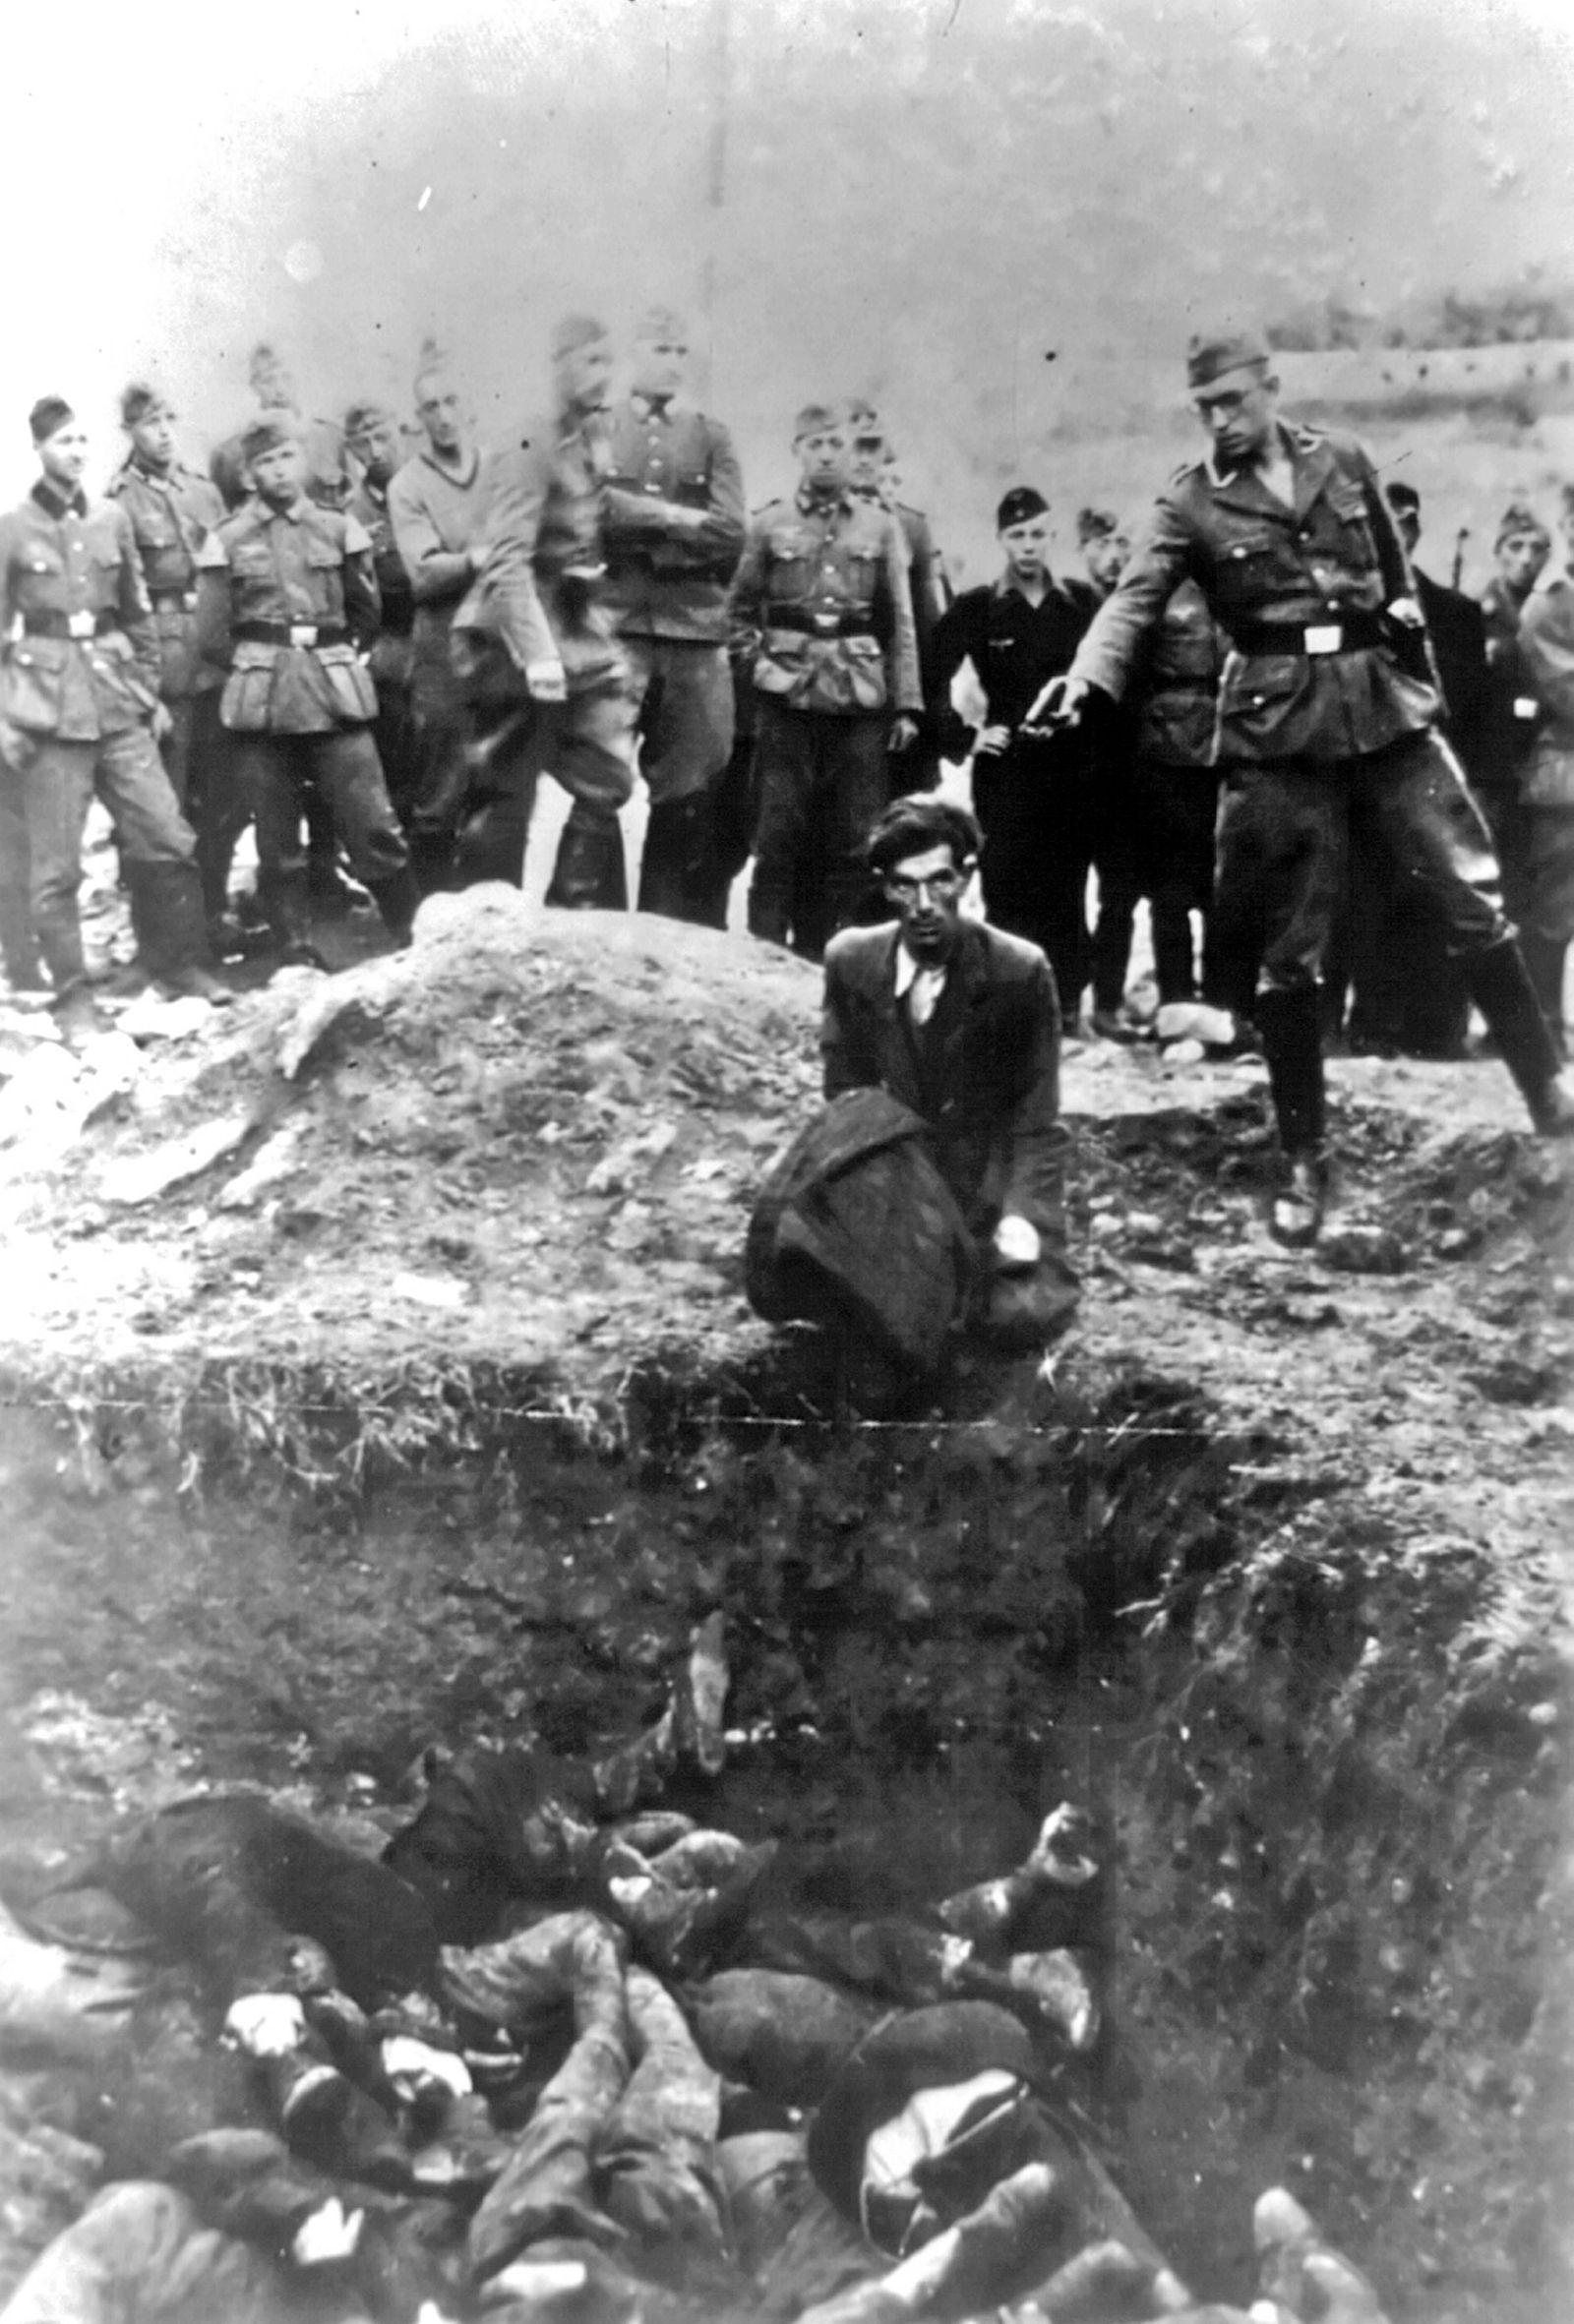 World war two holocaust Jews from Vinnitsa Ukraine executed by Einsatzgruppen 1941 World war two